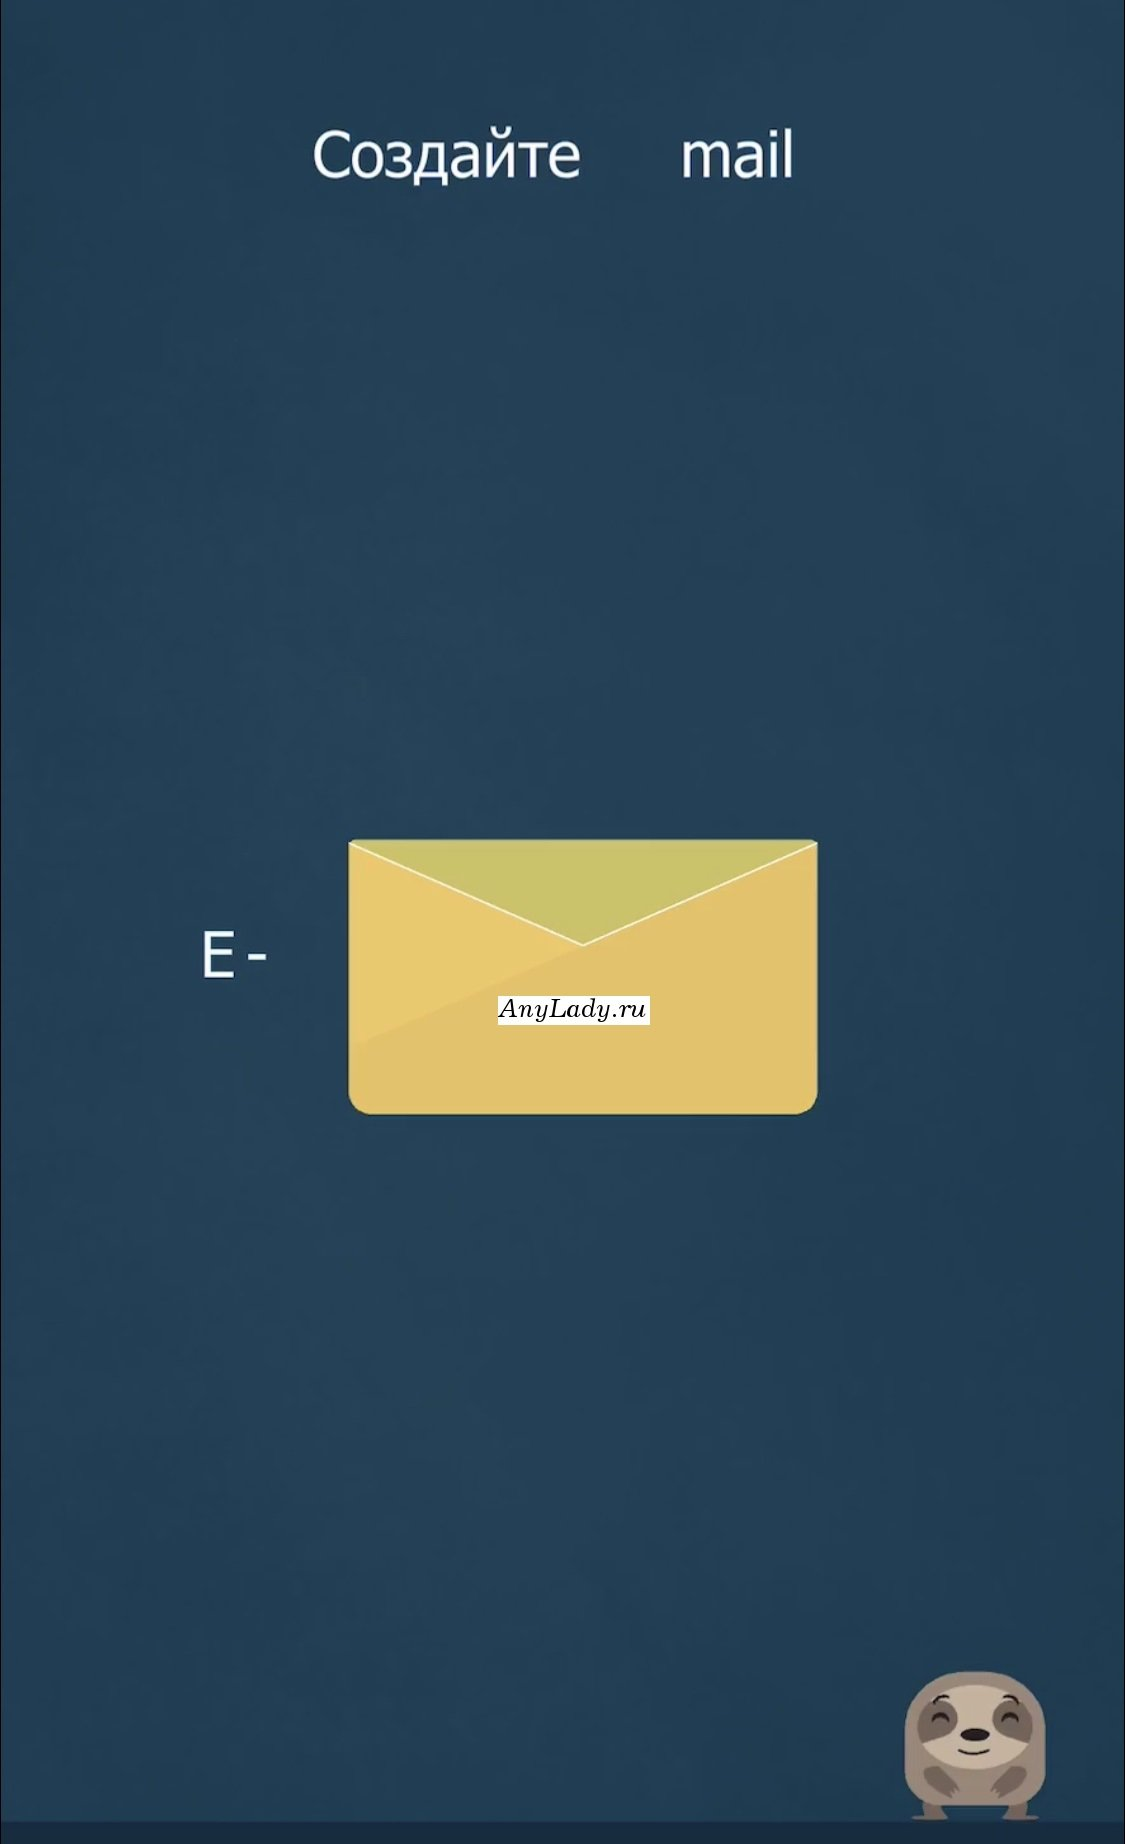 "Один раз тапните на письмо в конверте и оно за печатается. Далее перенесите ""E"" - из текста, и поставьте ее слева от письма"